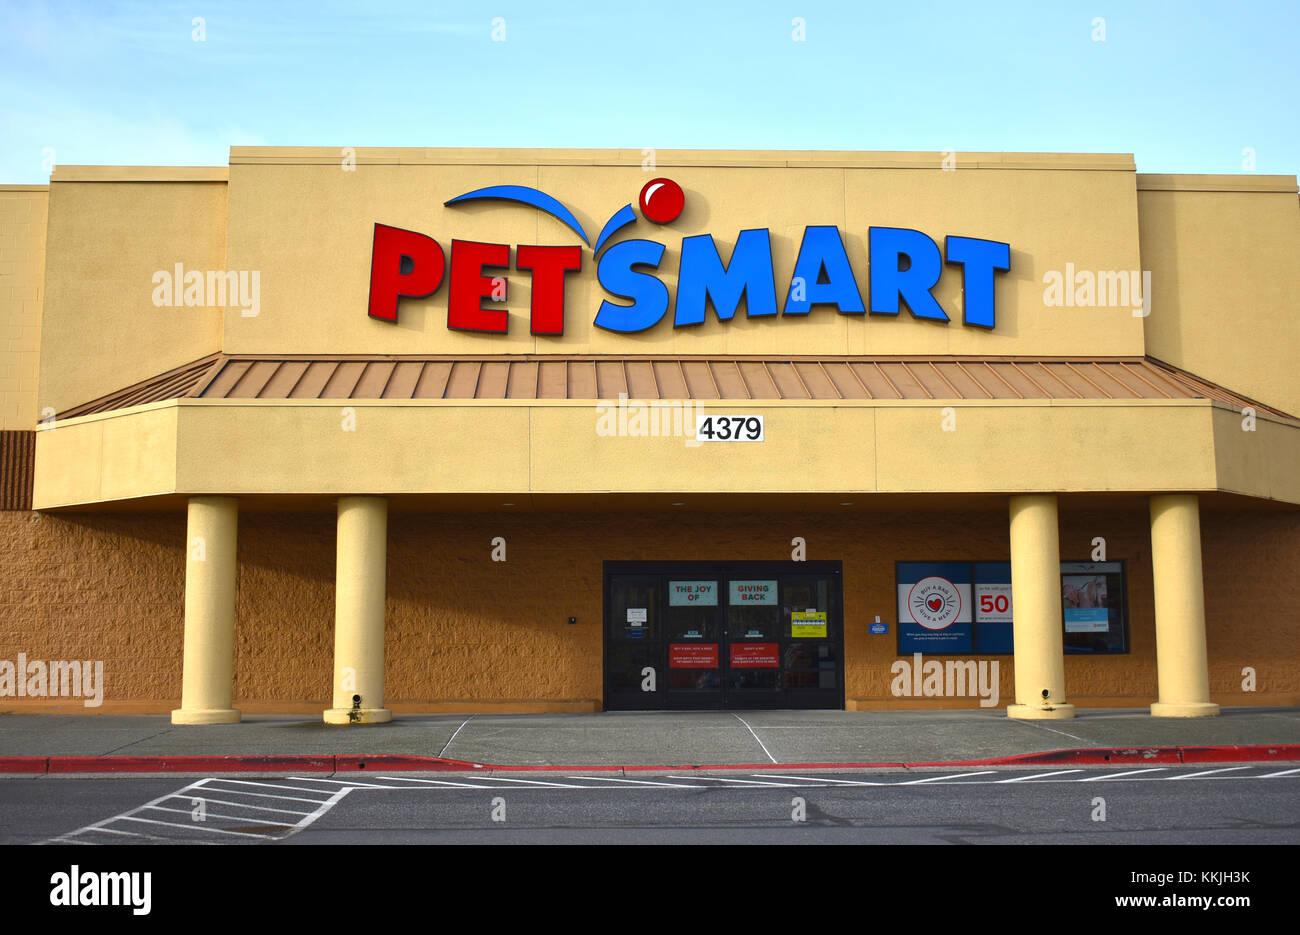 Petsmart storefront